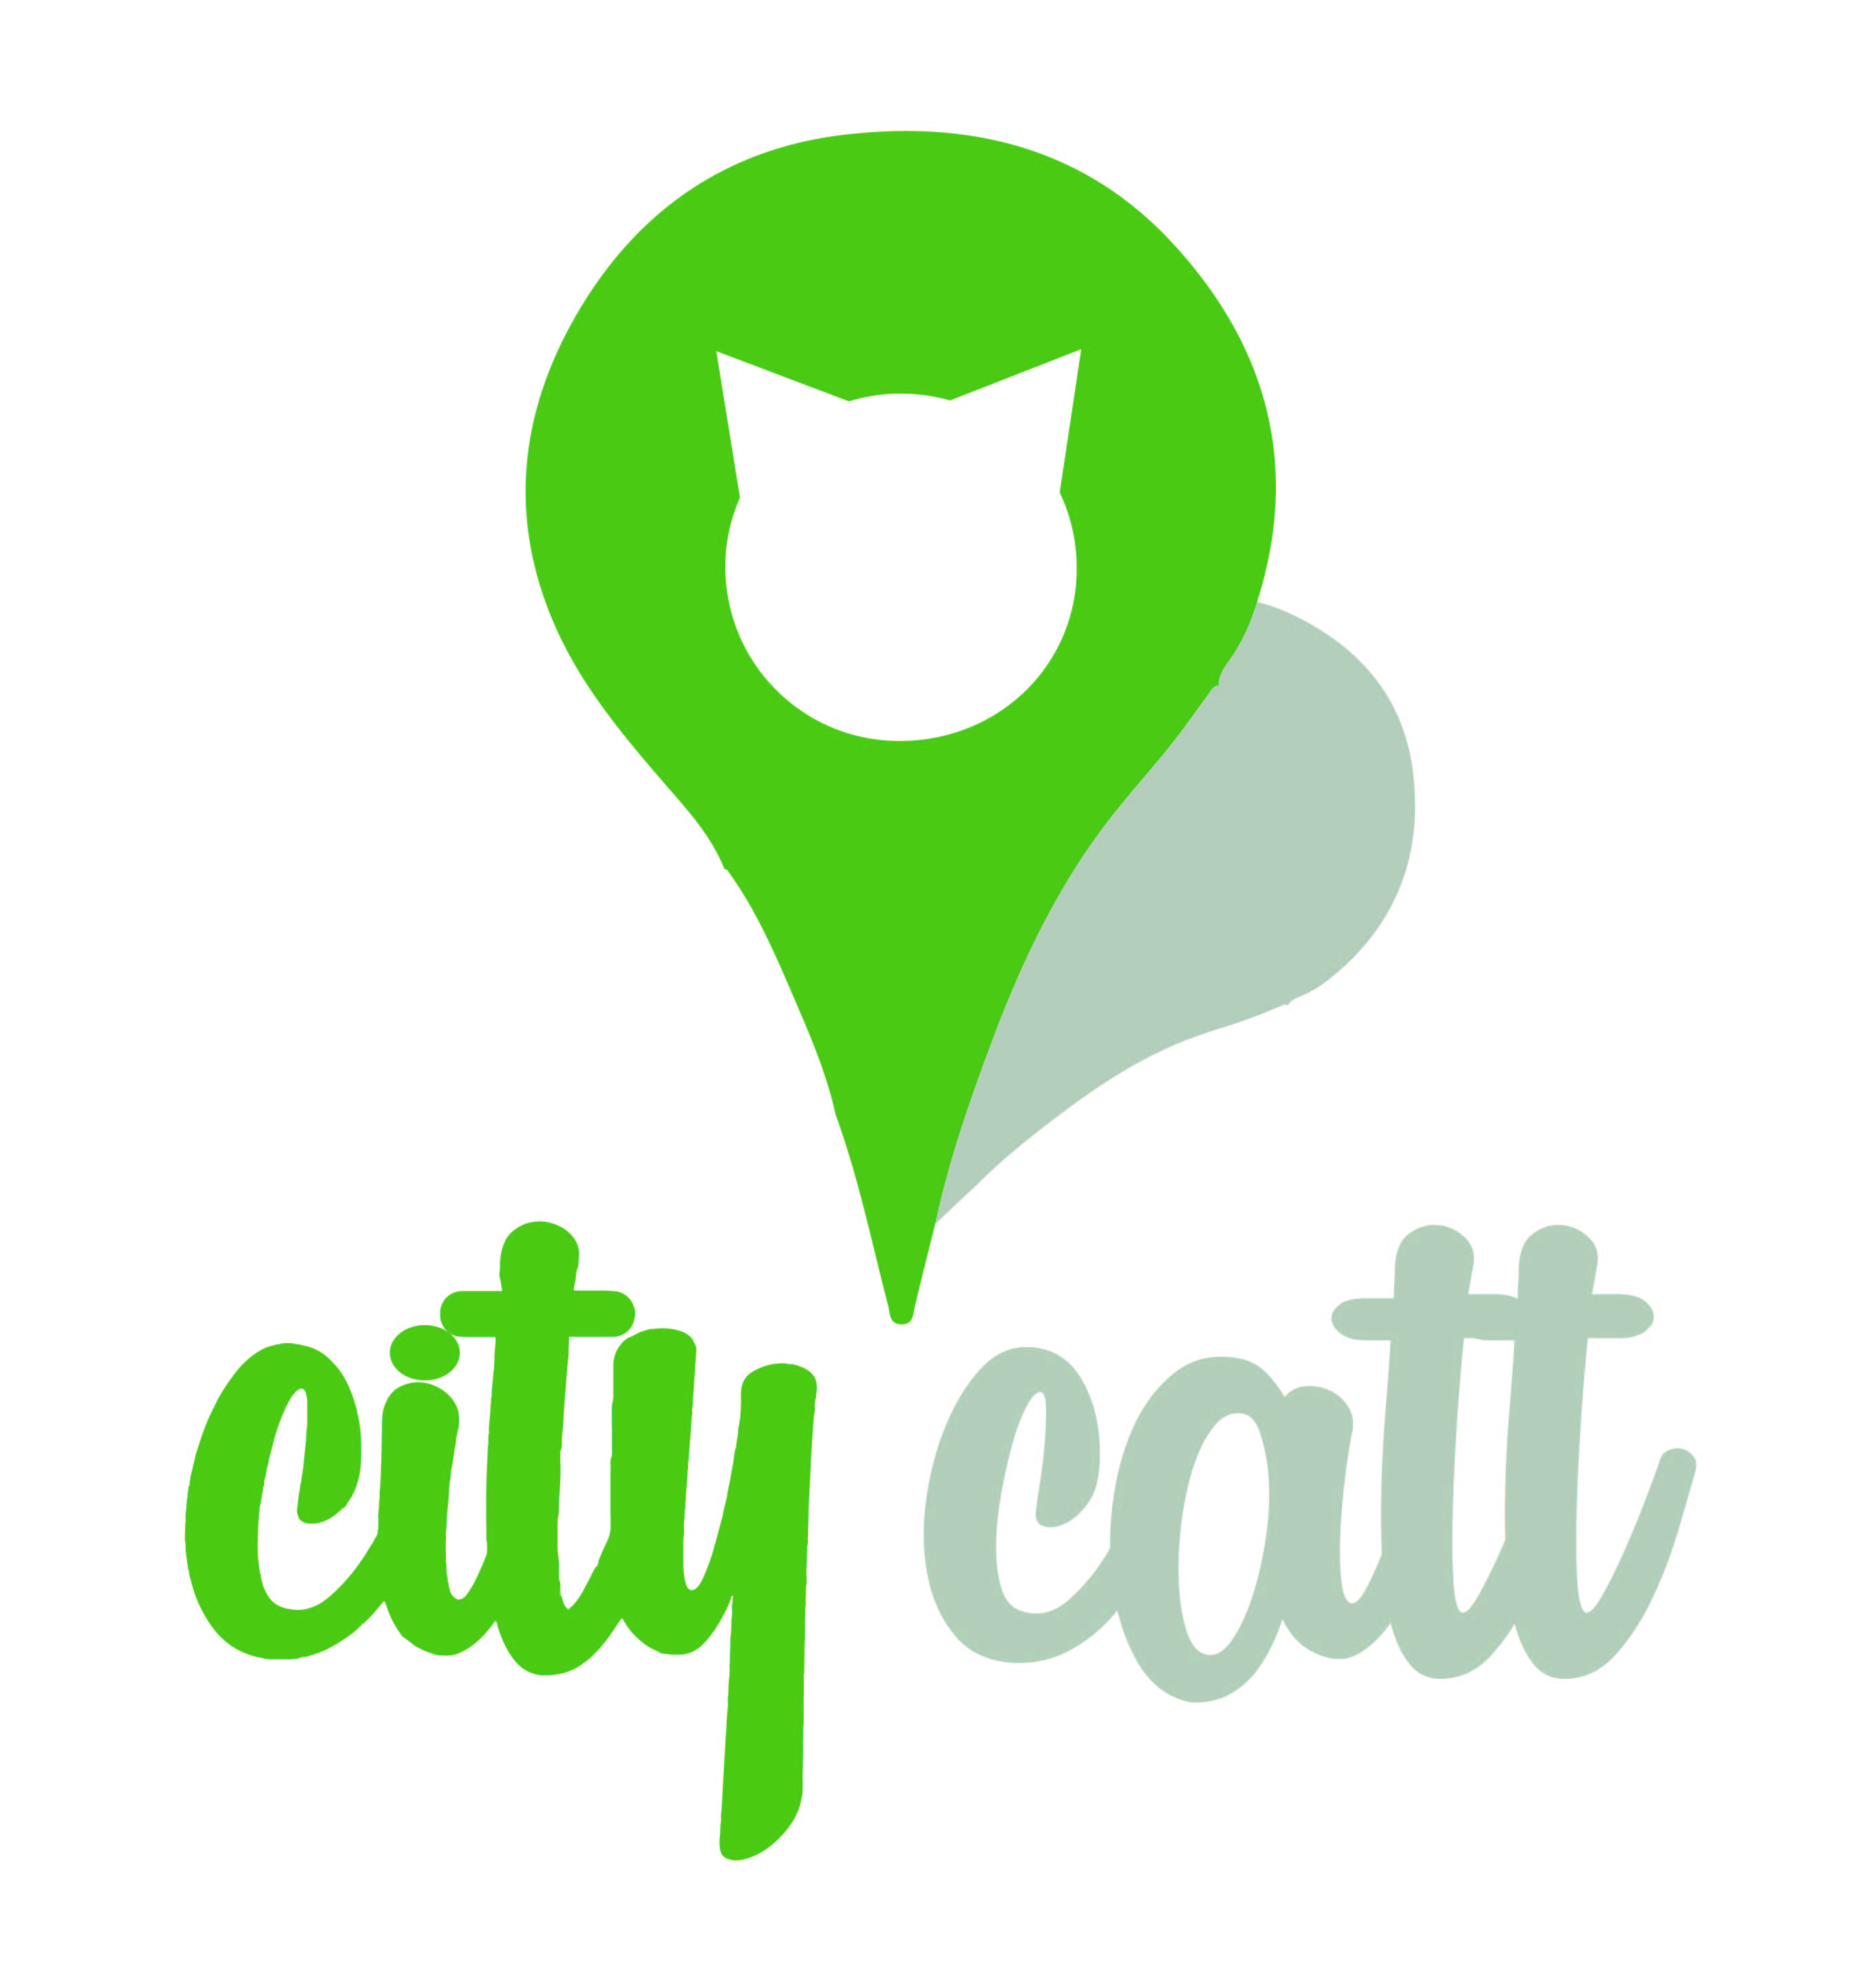 City Catt icon